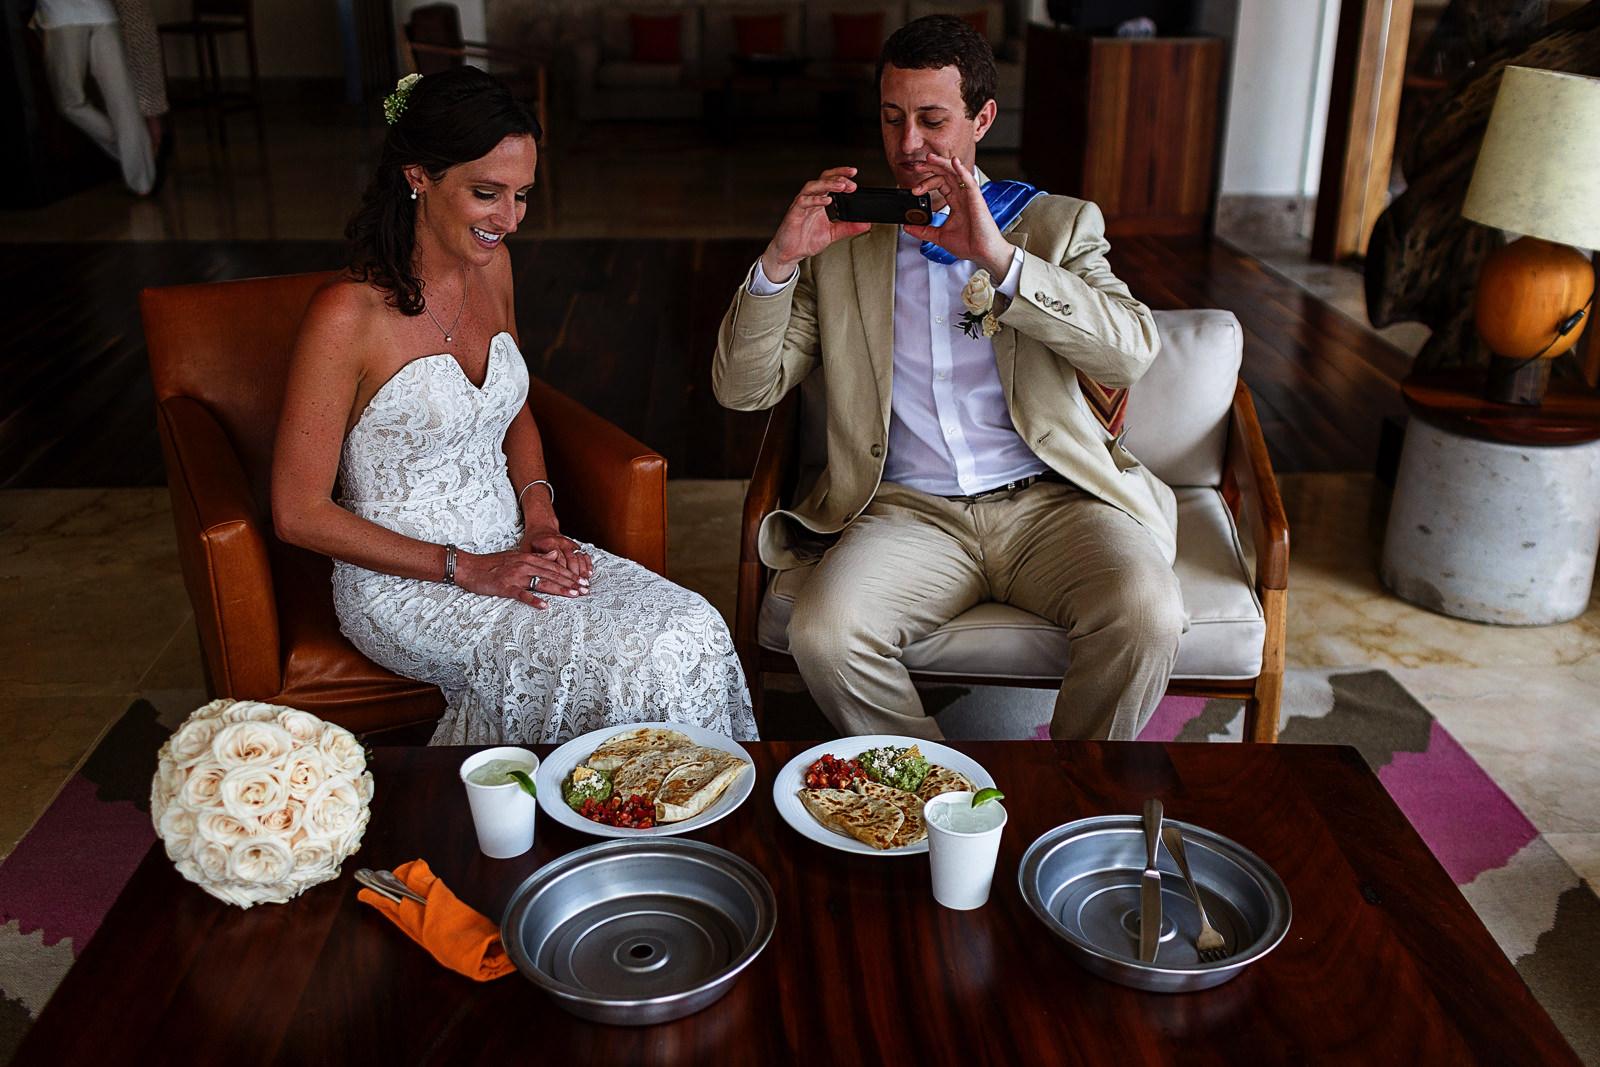 Bride and groom enjoy quesadillas with guacamole after the couple's portraits - Eder Acevedo cancun los cabos vallarta wedding photographer